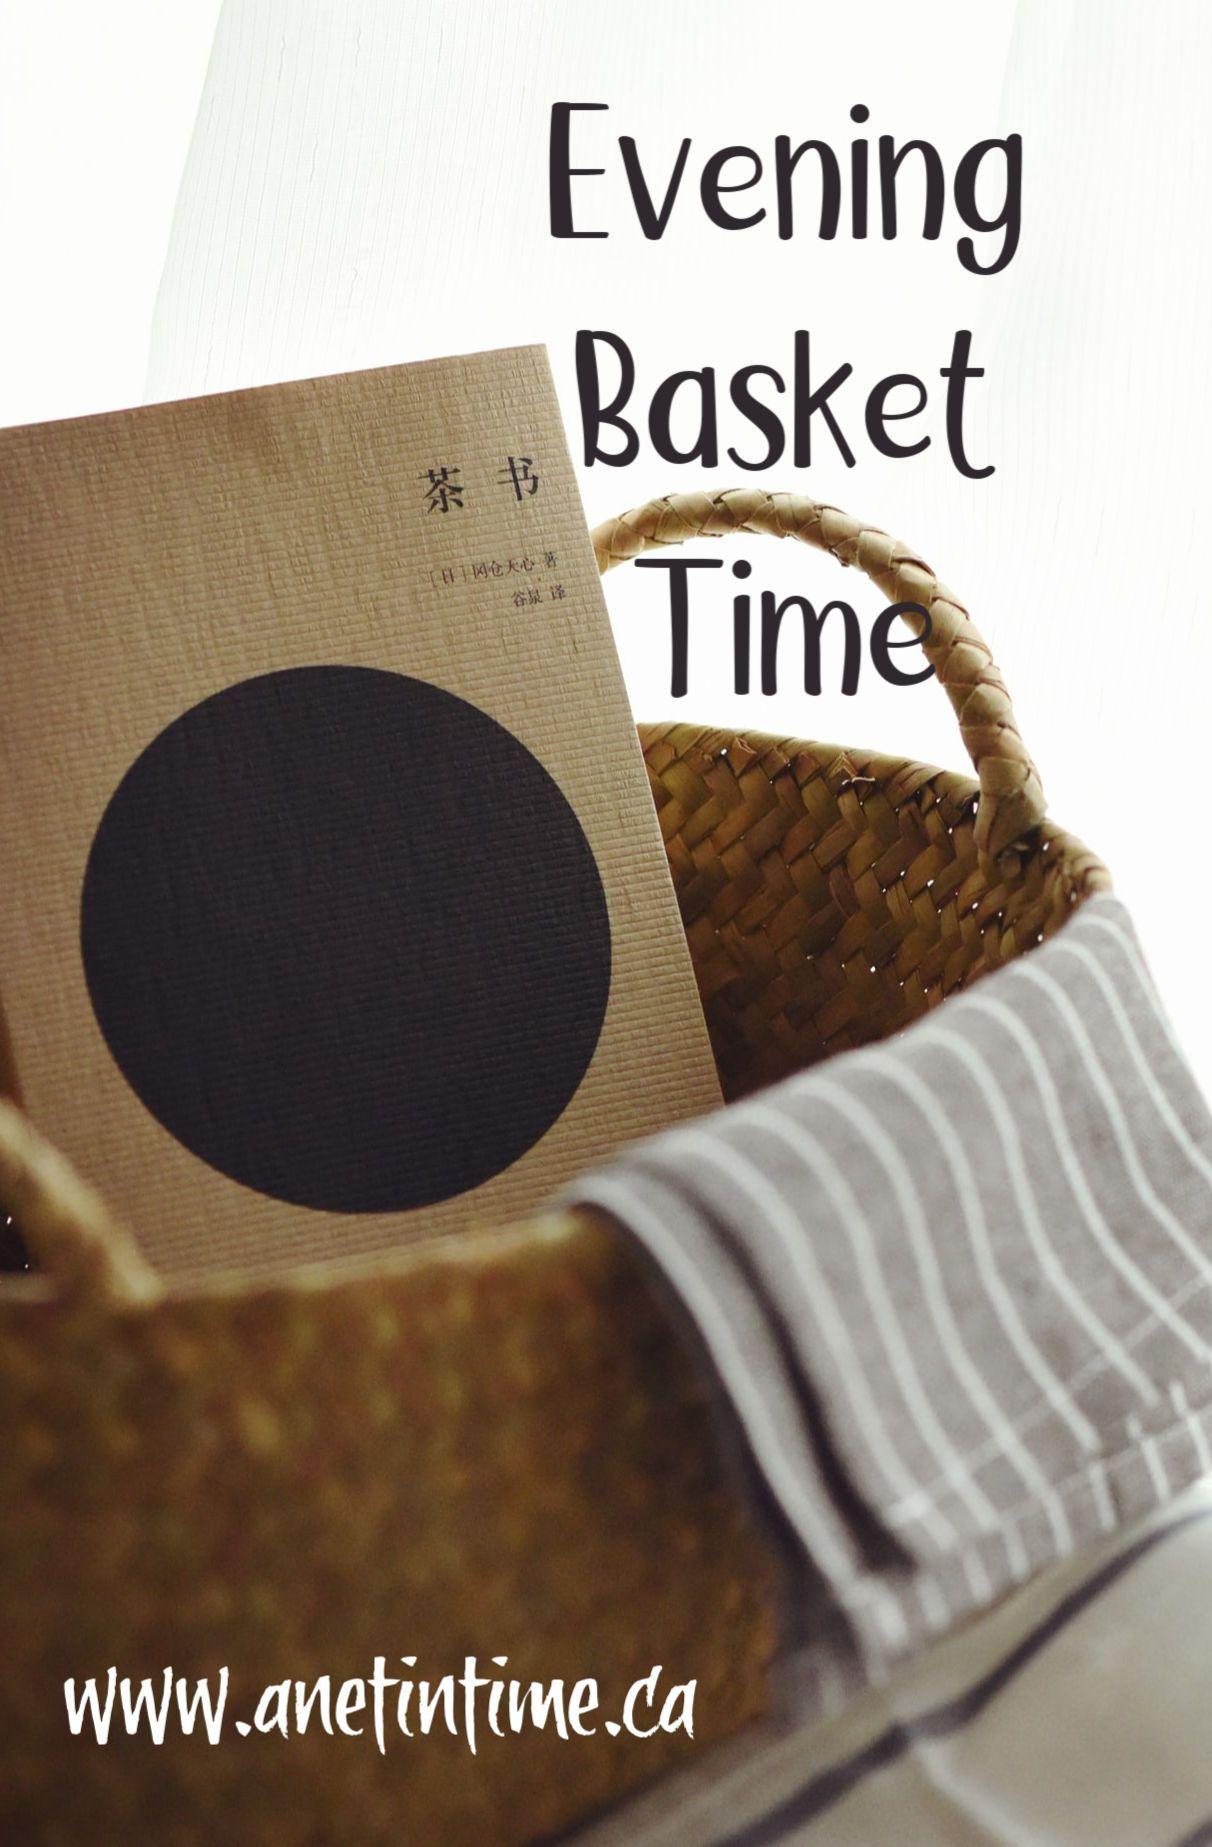 Evening Basket Time A Net In Time How To Memorize Things Charlotte Mason Homeschool Preschool Fun [ 1847 x 1212 Pixel ]